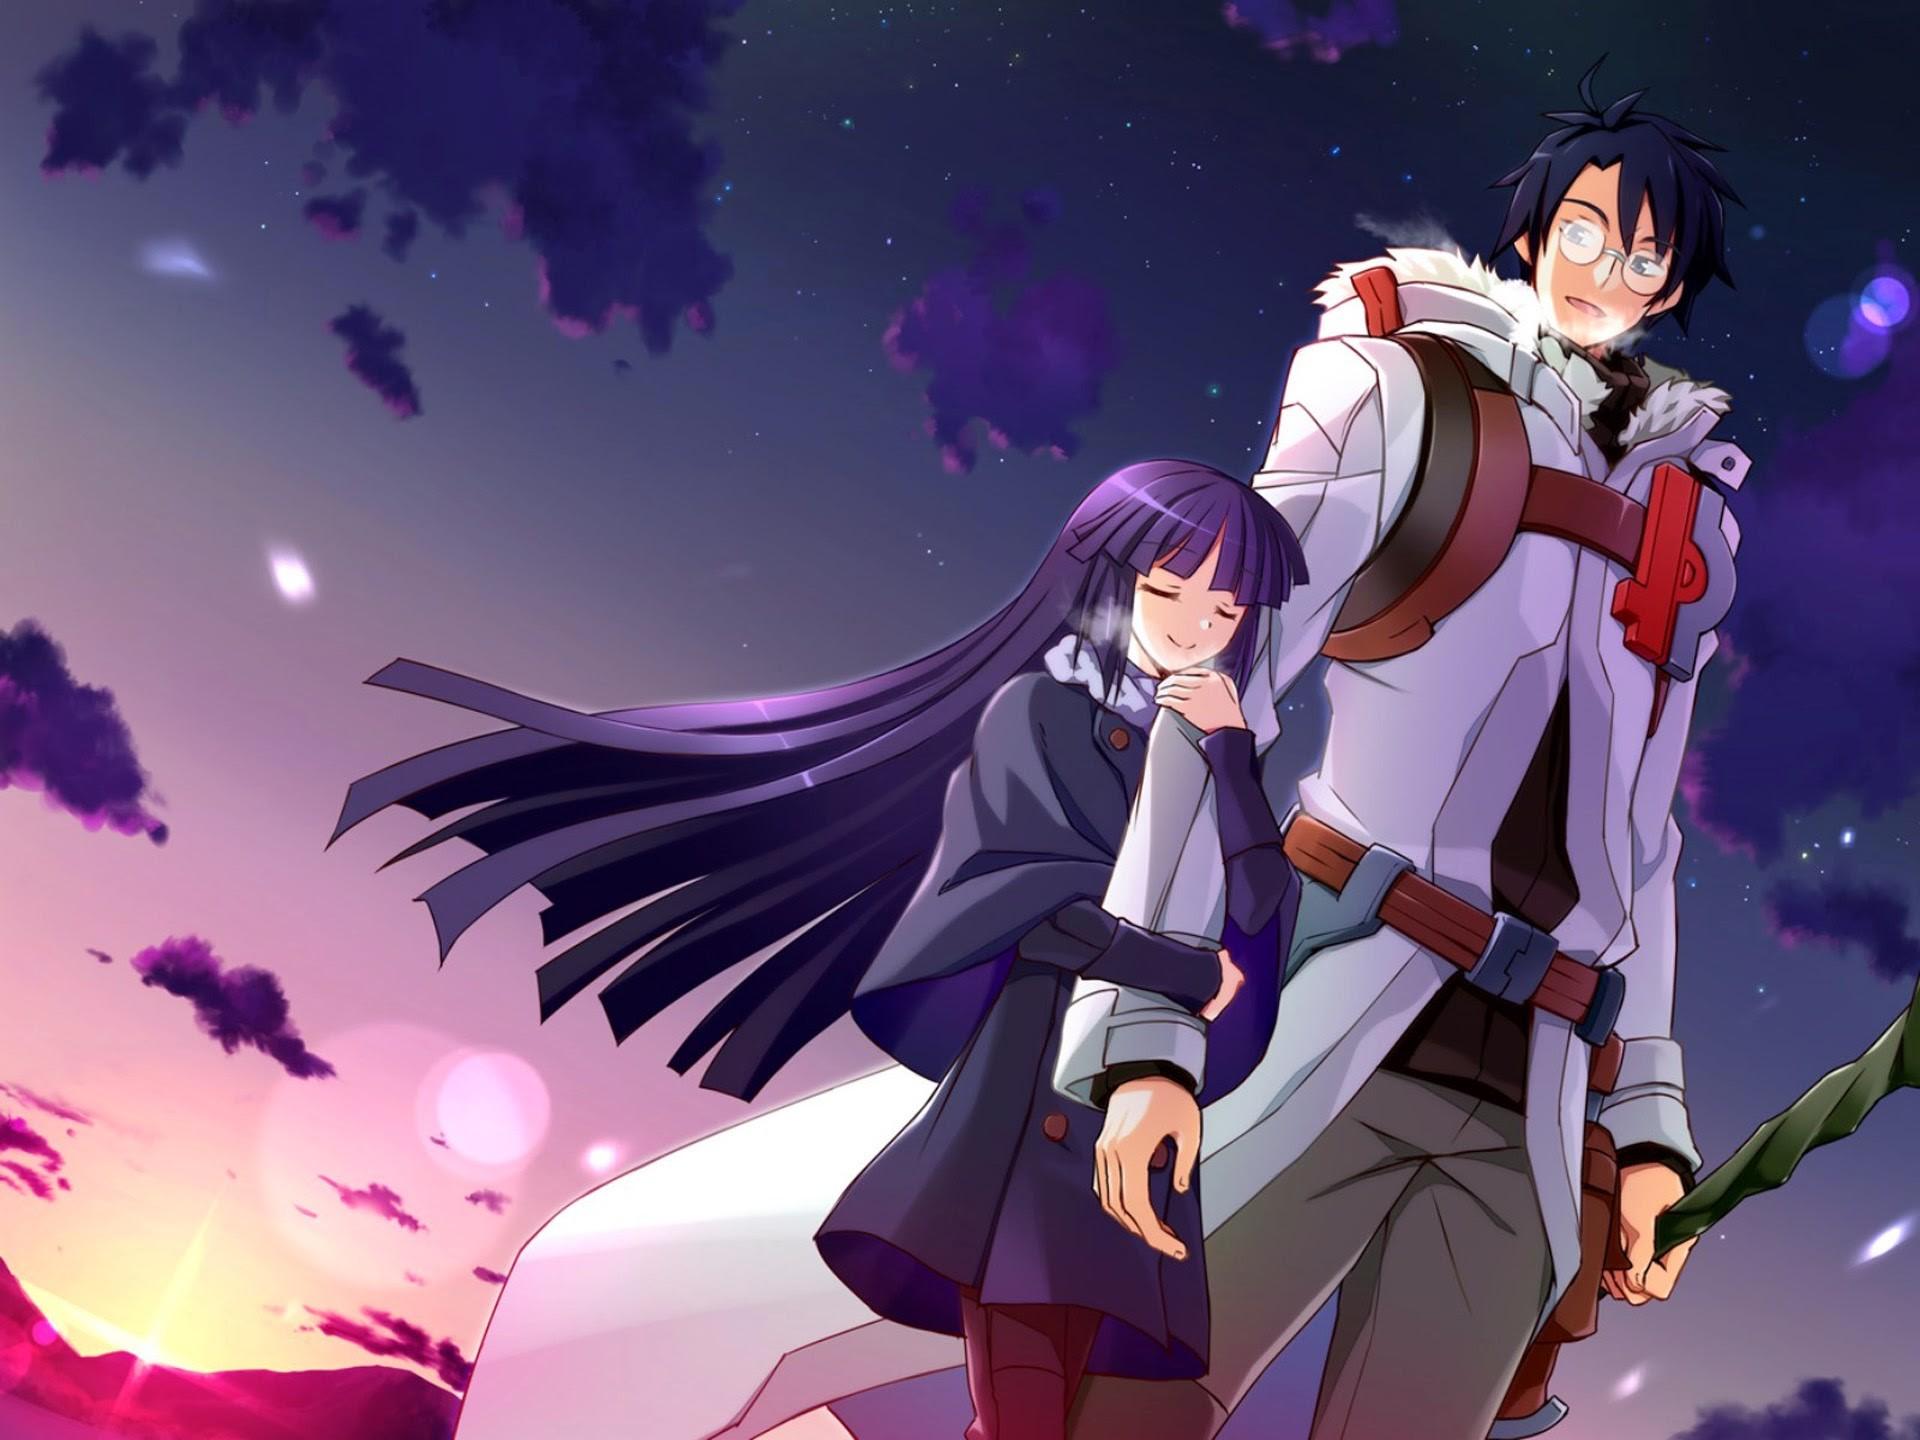 shiroe akatsuki log horizon anime hd wallpaper 9t.